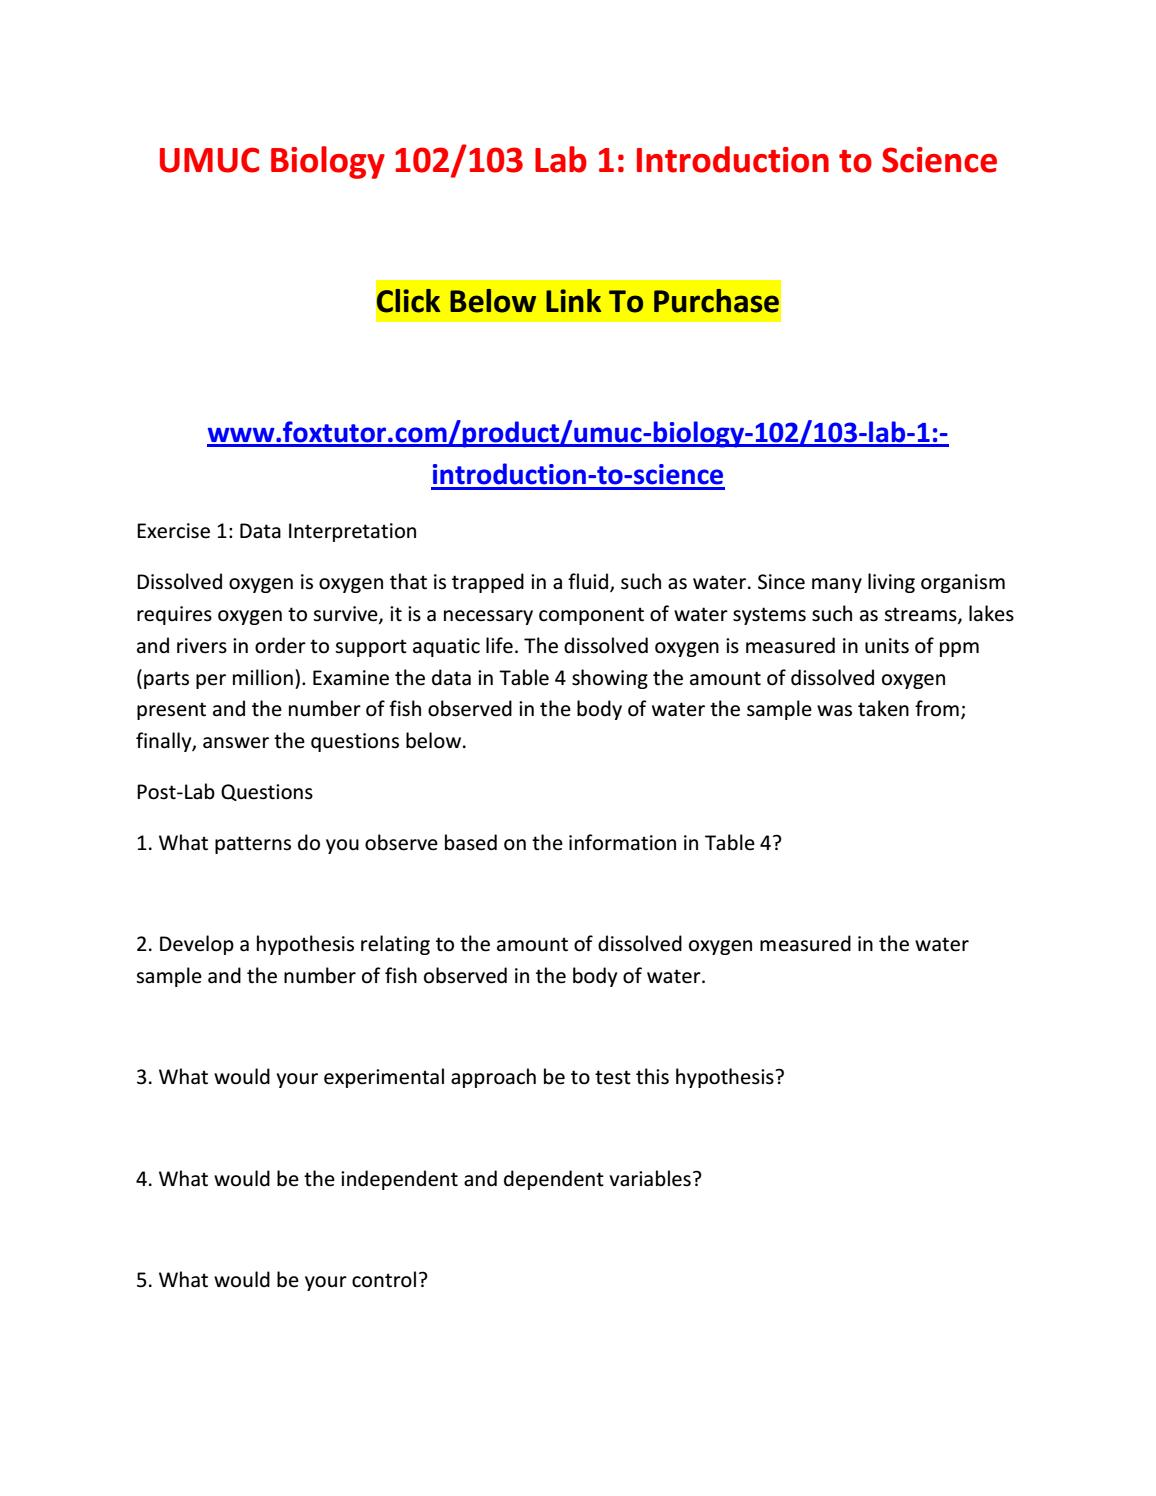 custom lab manual umuc biol 102 103 Umuc biology 102 103 lab 5: meiosis - homework - use the laboratory manual located under course content  biology 103 lab manual answers | education at edu libs .